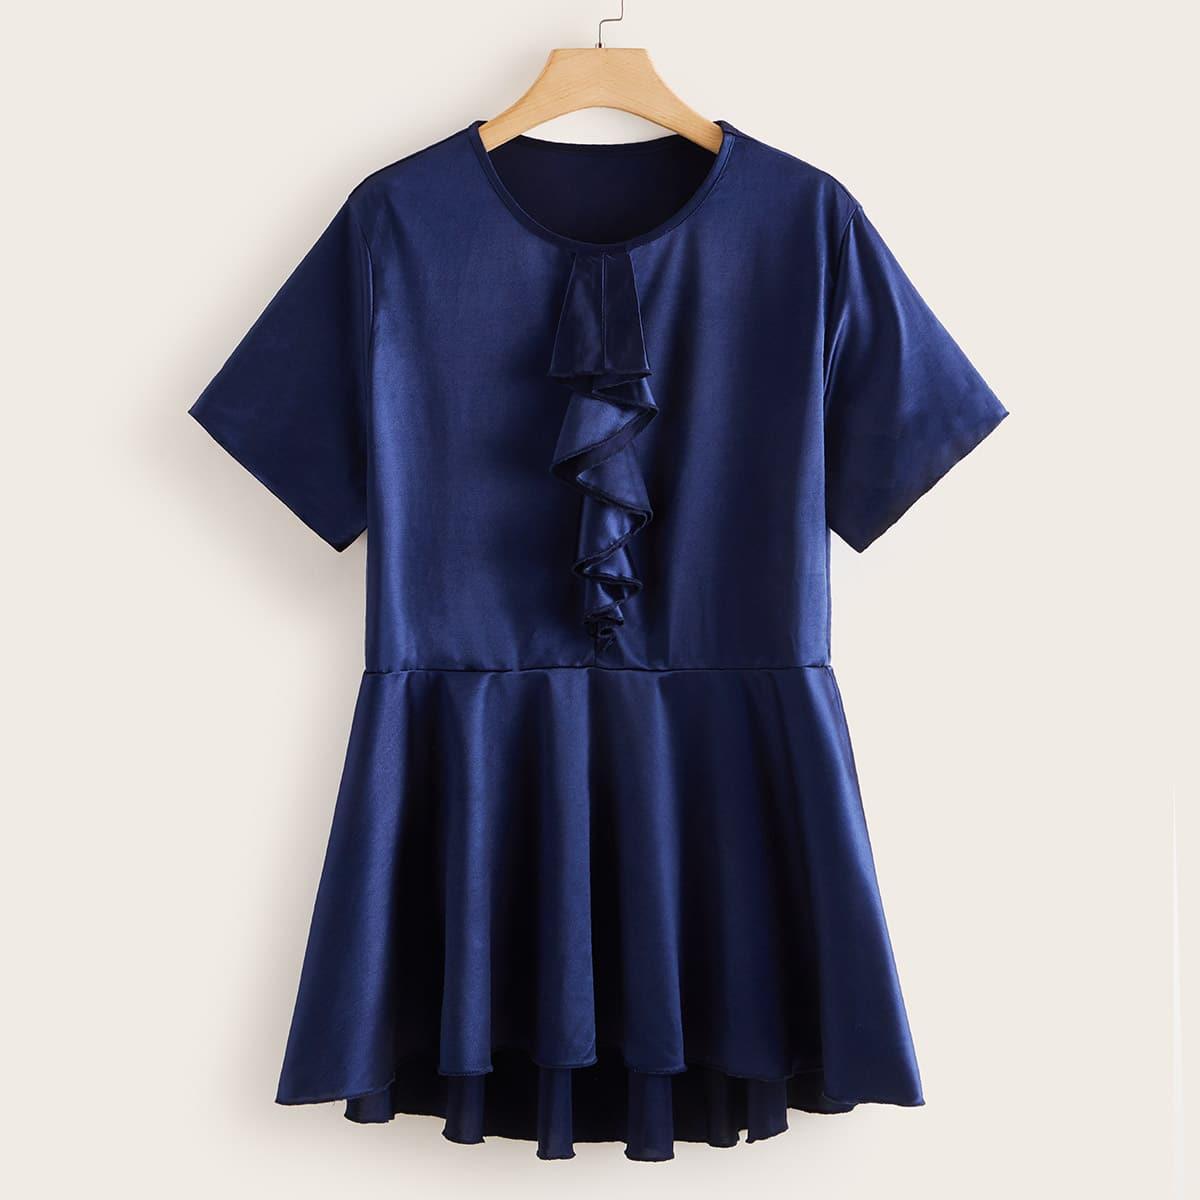 shein Marine Elegant Vlak Grote maten blouses Geribd